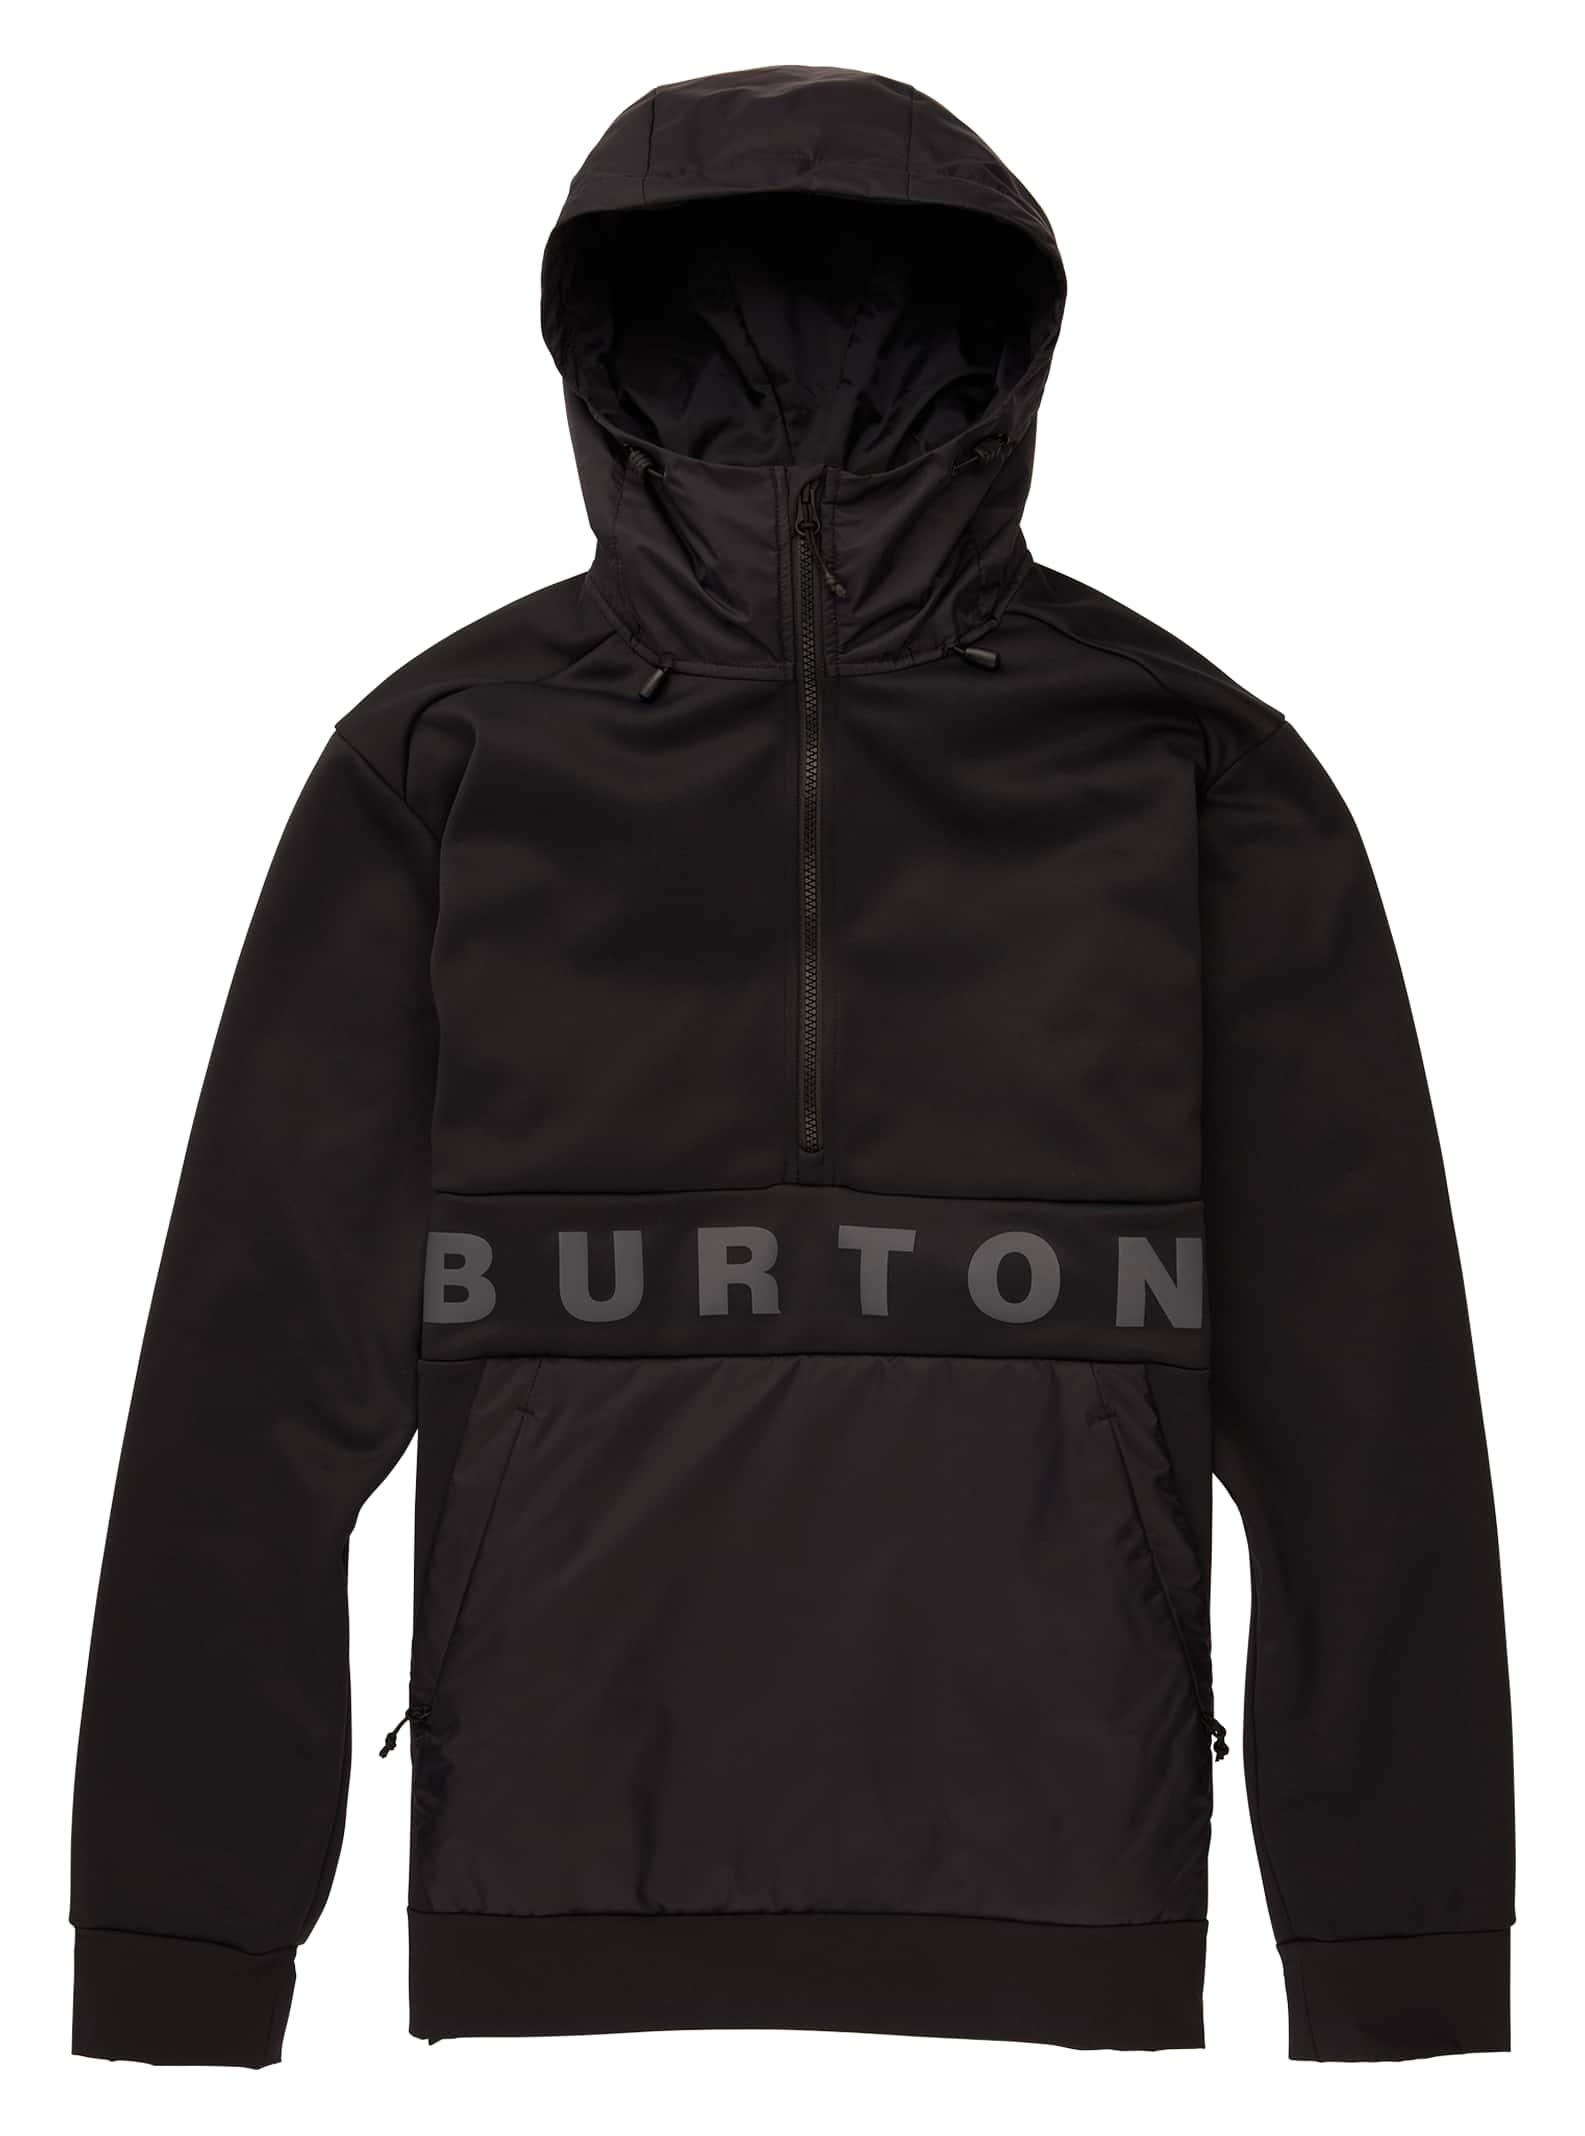 Burton Crown Bonded Performance pullovertröja i fleece, L